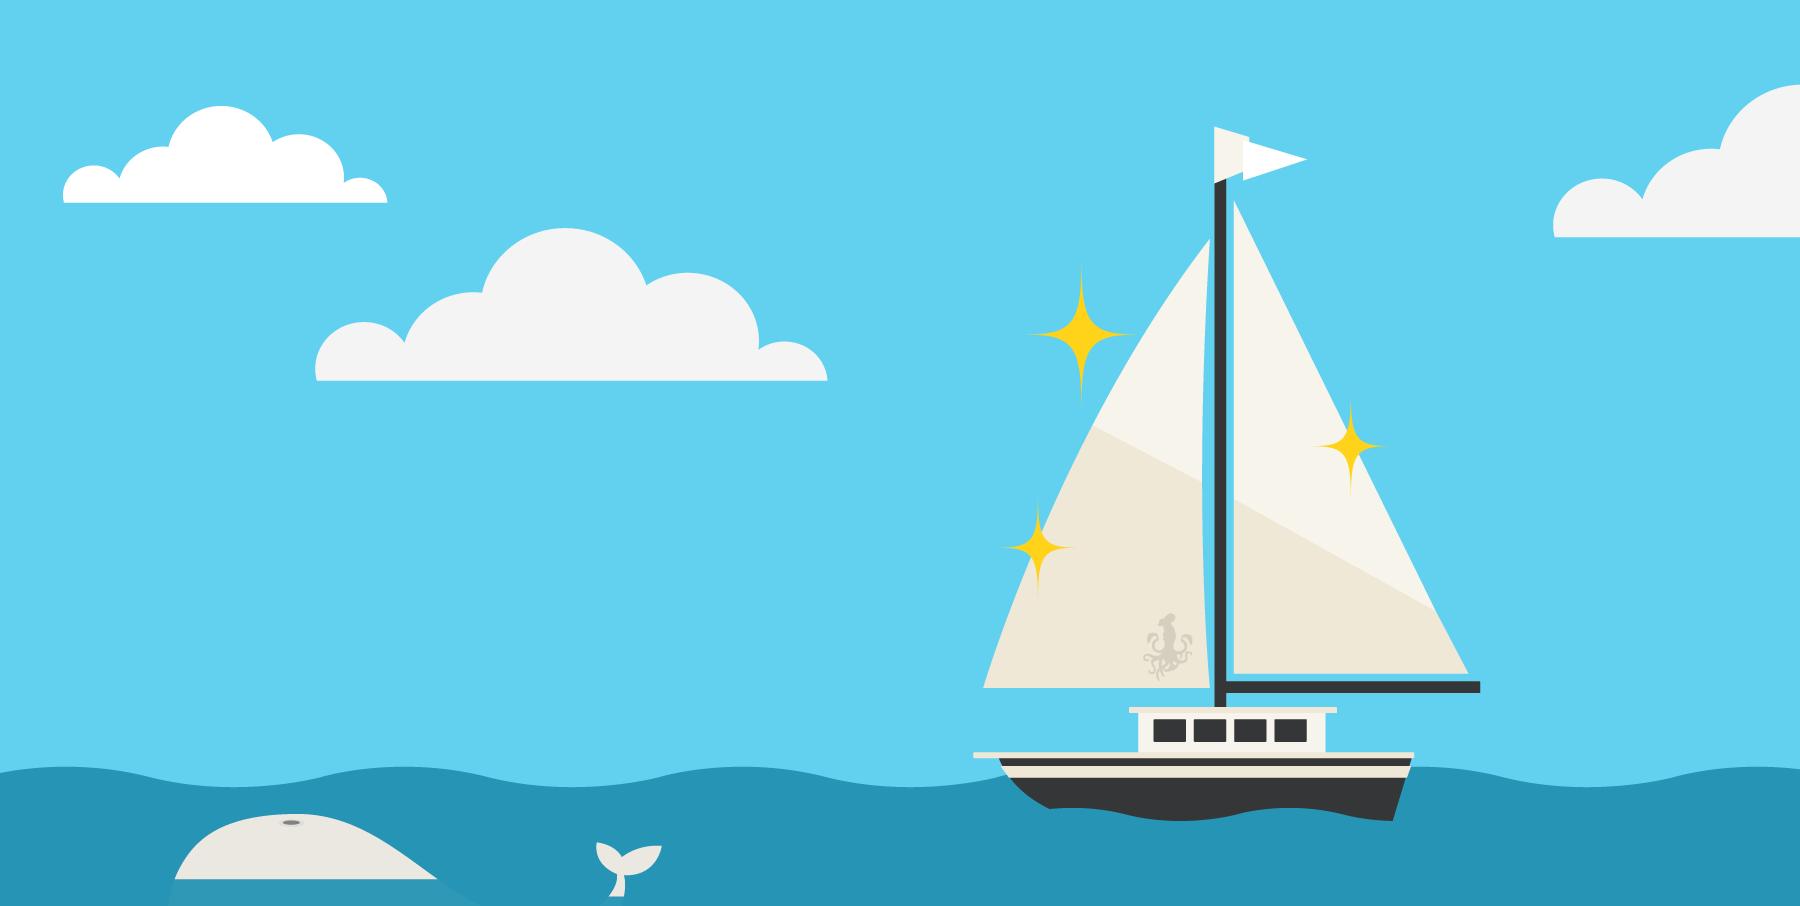 New sails illustration